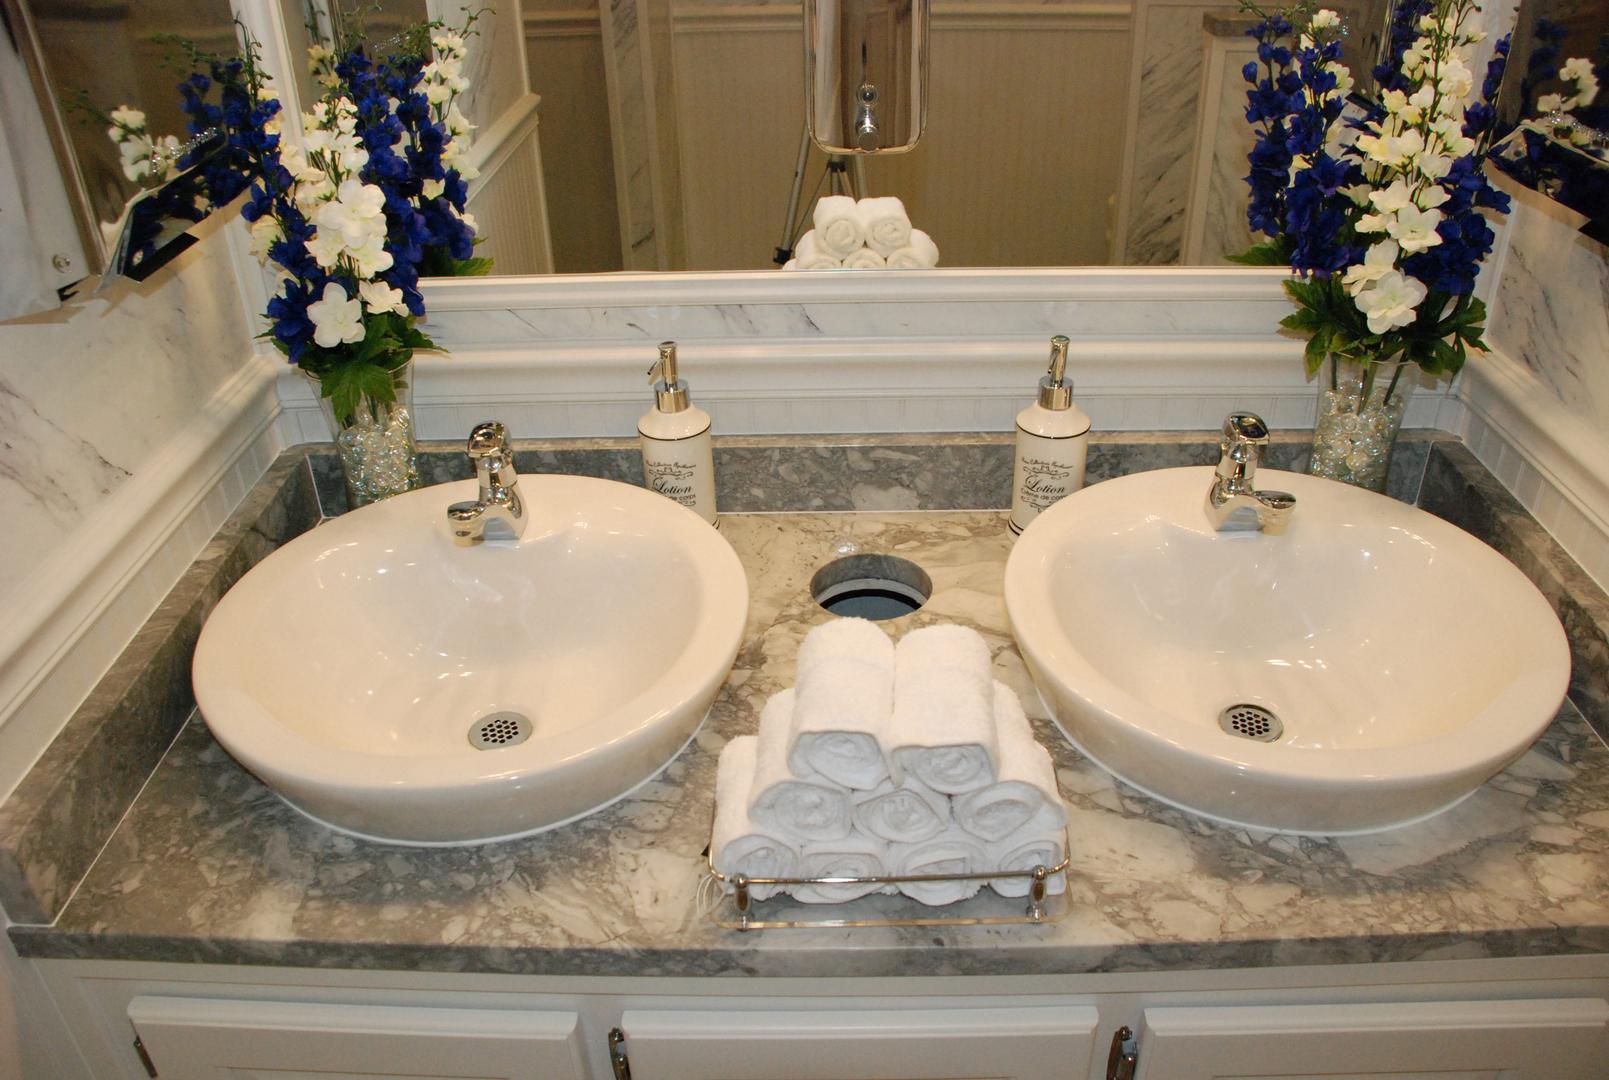 Bathroom Rentals 4 stall portable restroom trailers